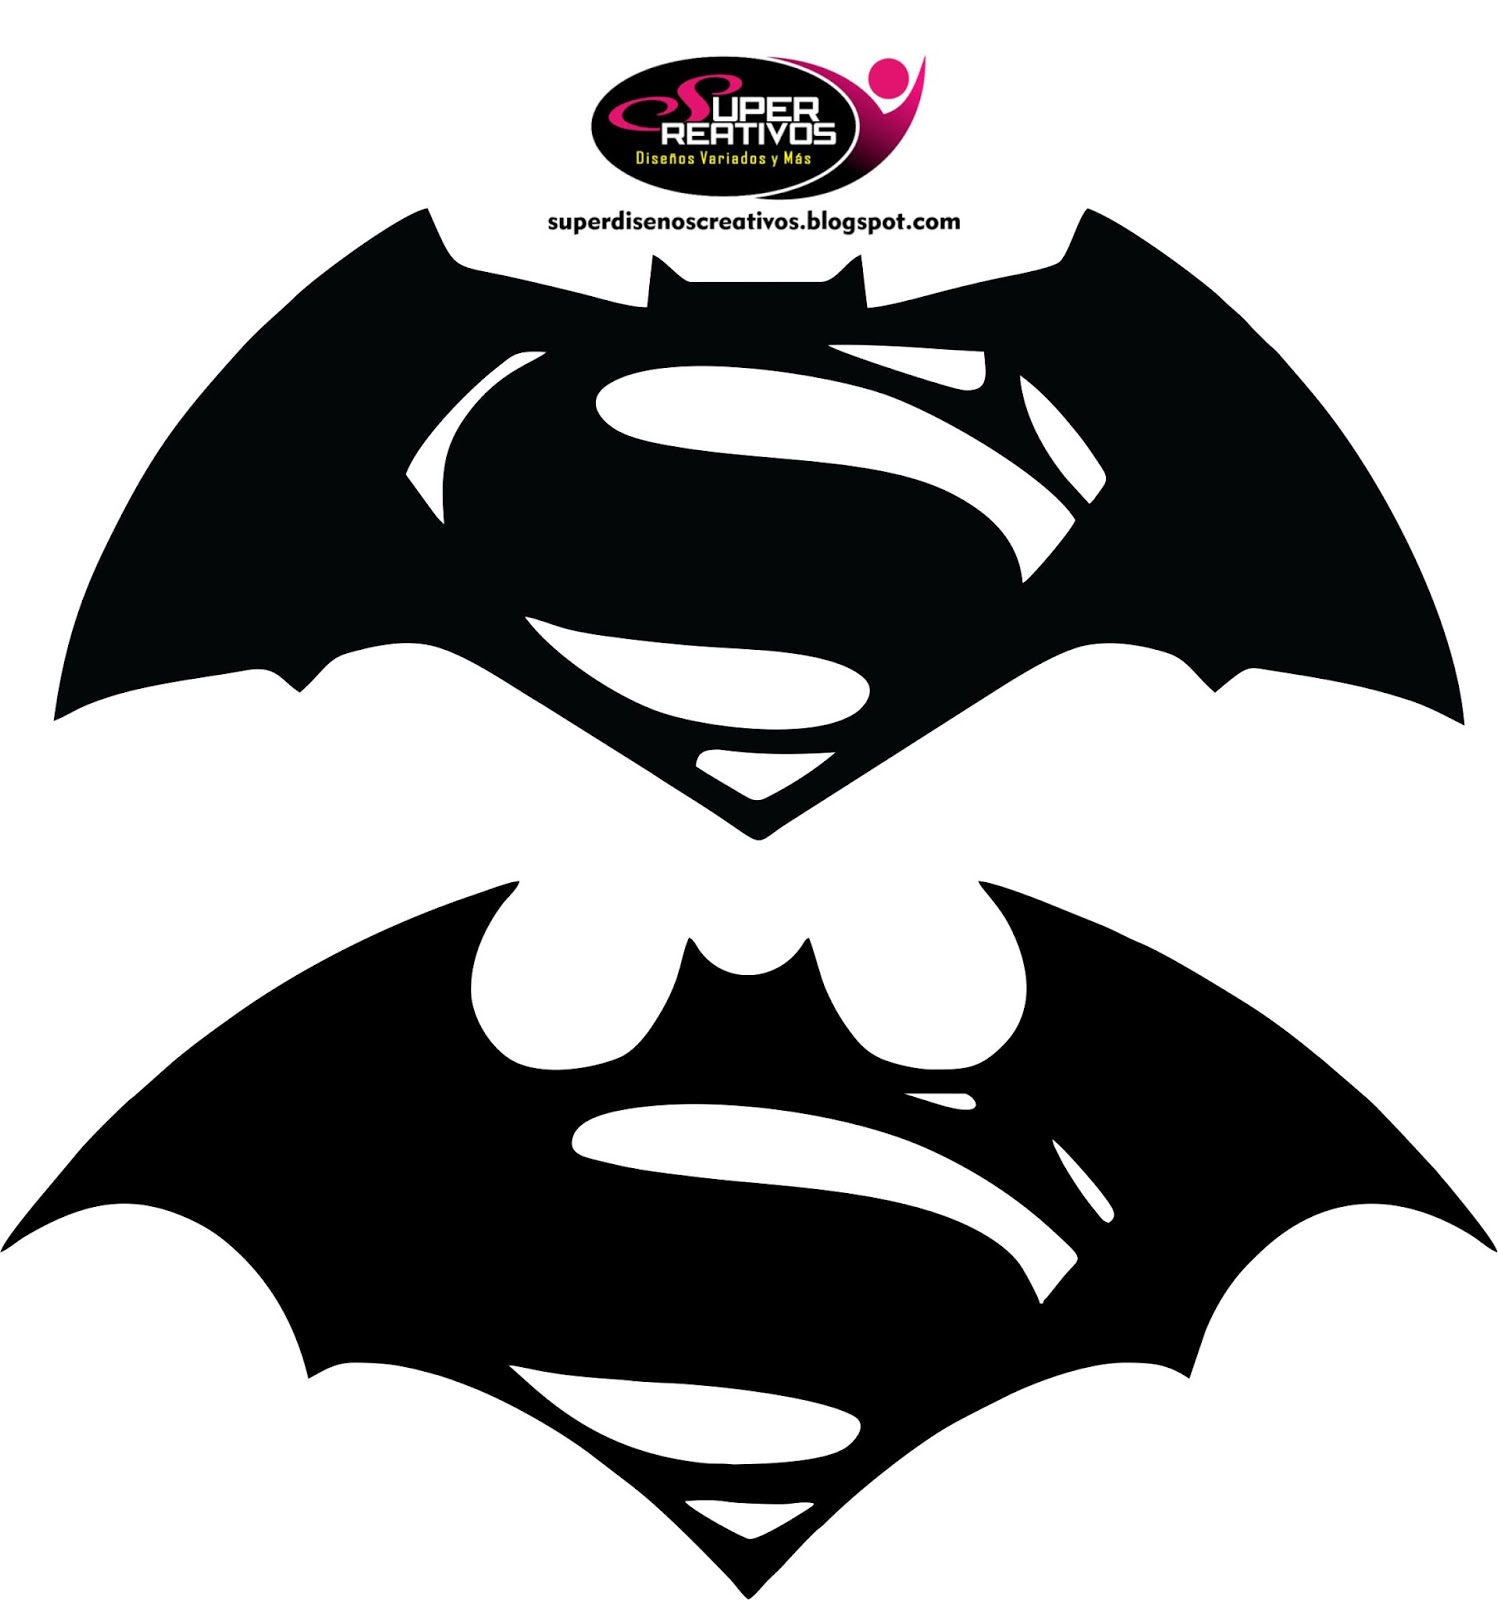 imagen del logo de superman » Full HD Pictures [4K Ultra] | Full ...